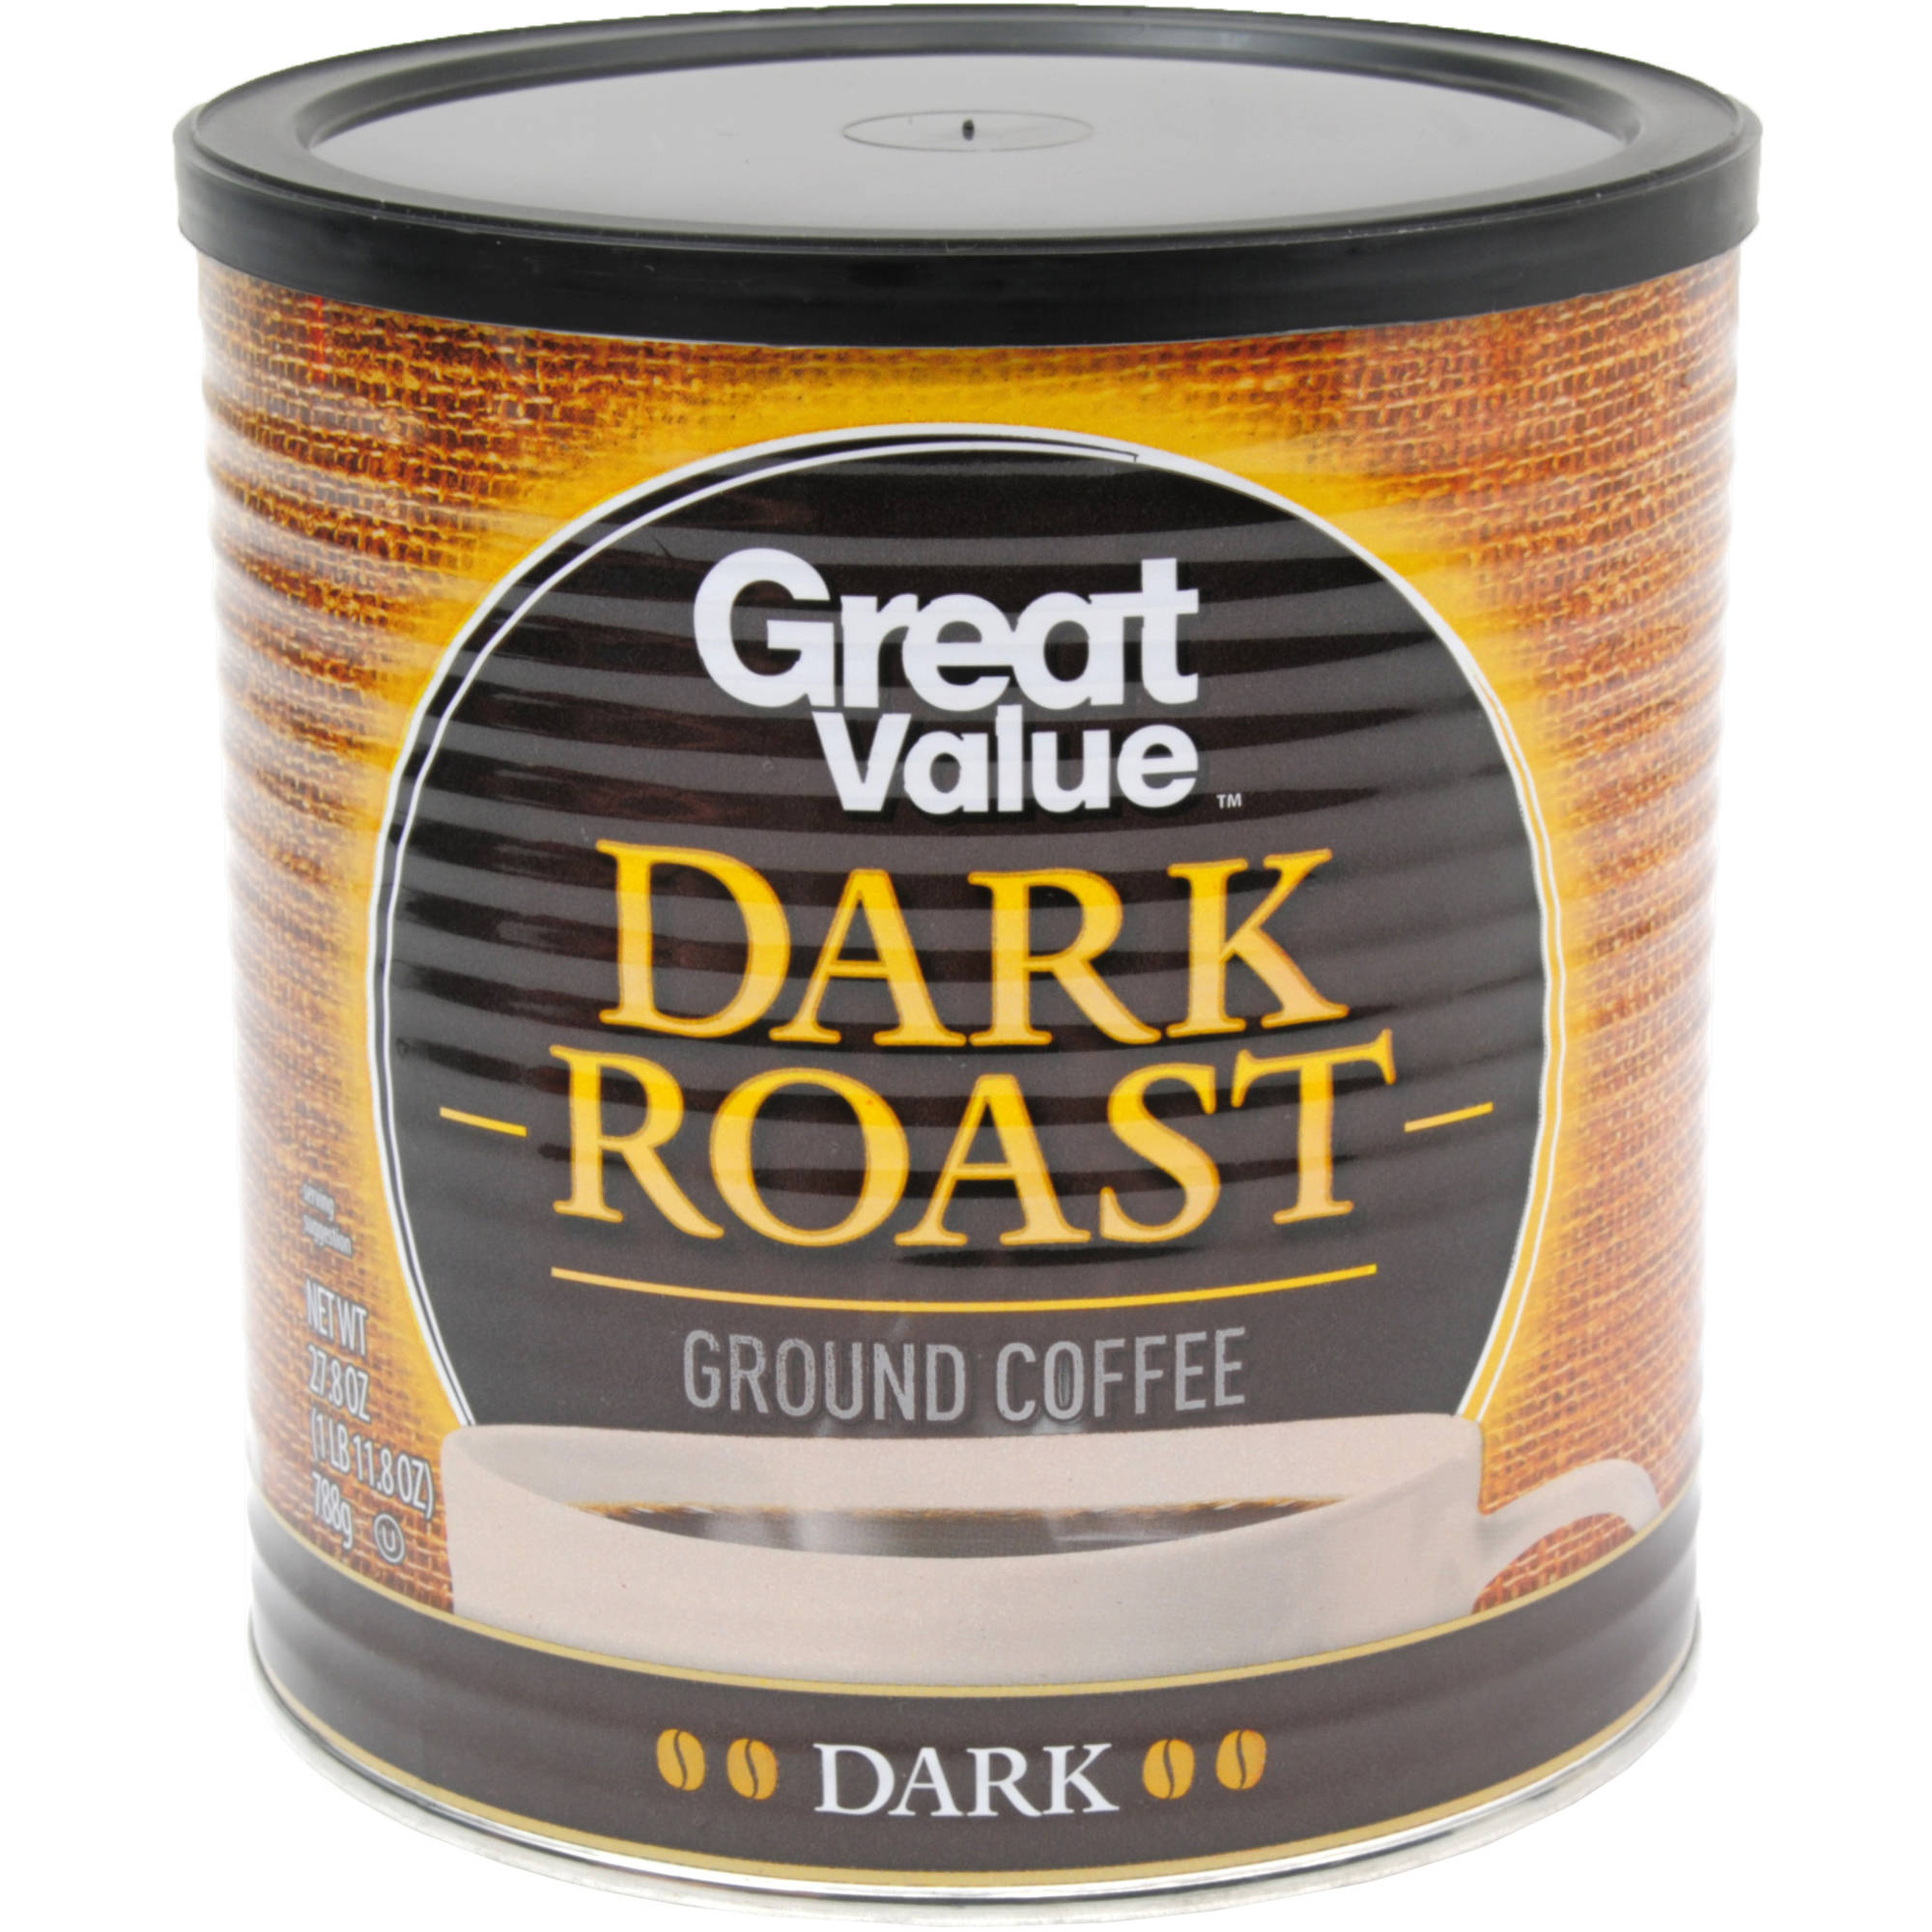 Great Value Dark Roast Ground Coffee, 27.8 oz